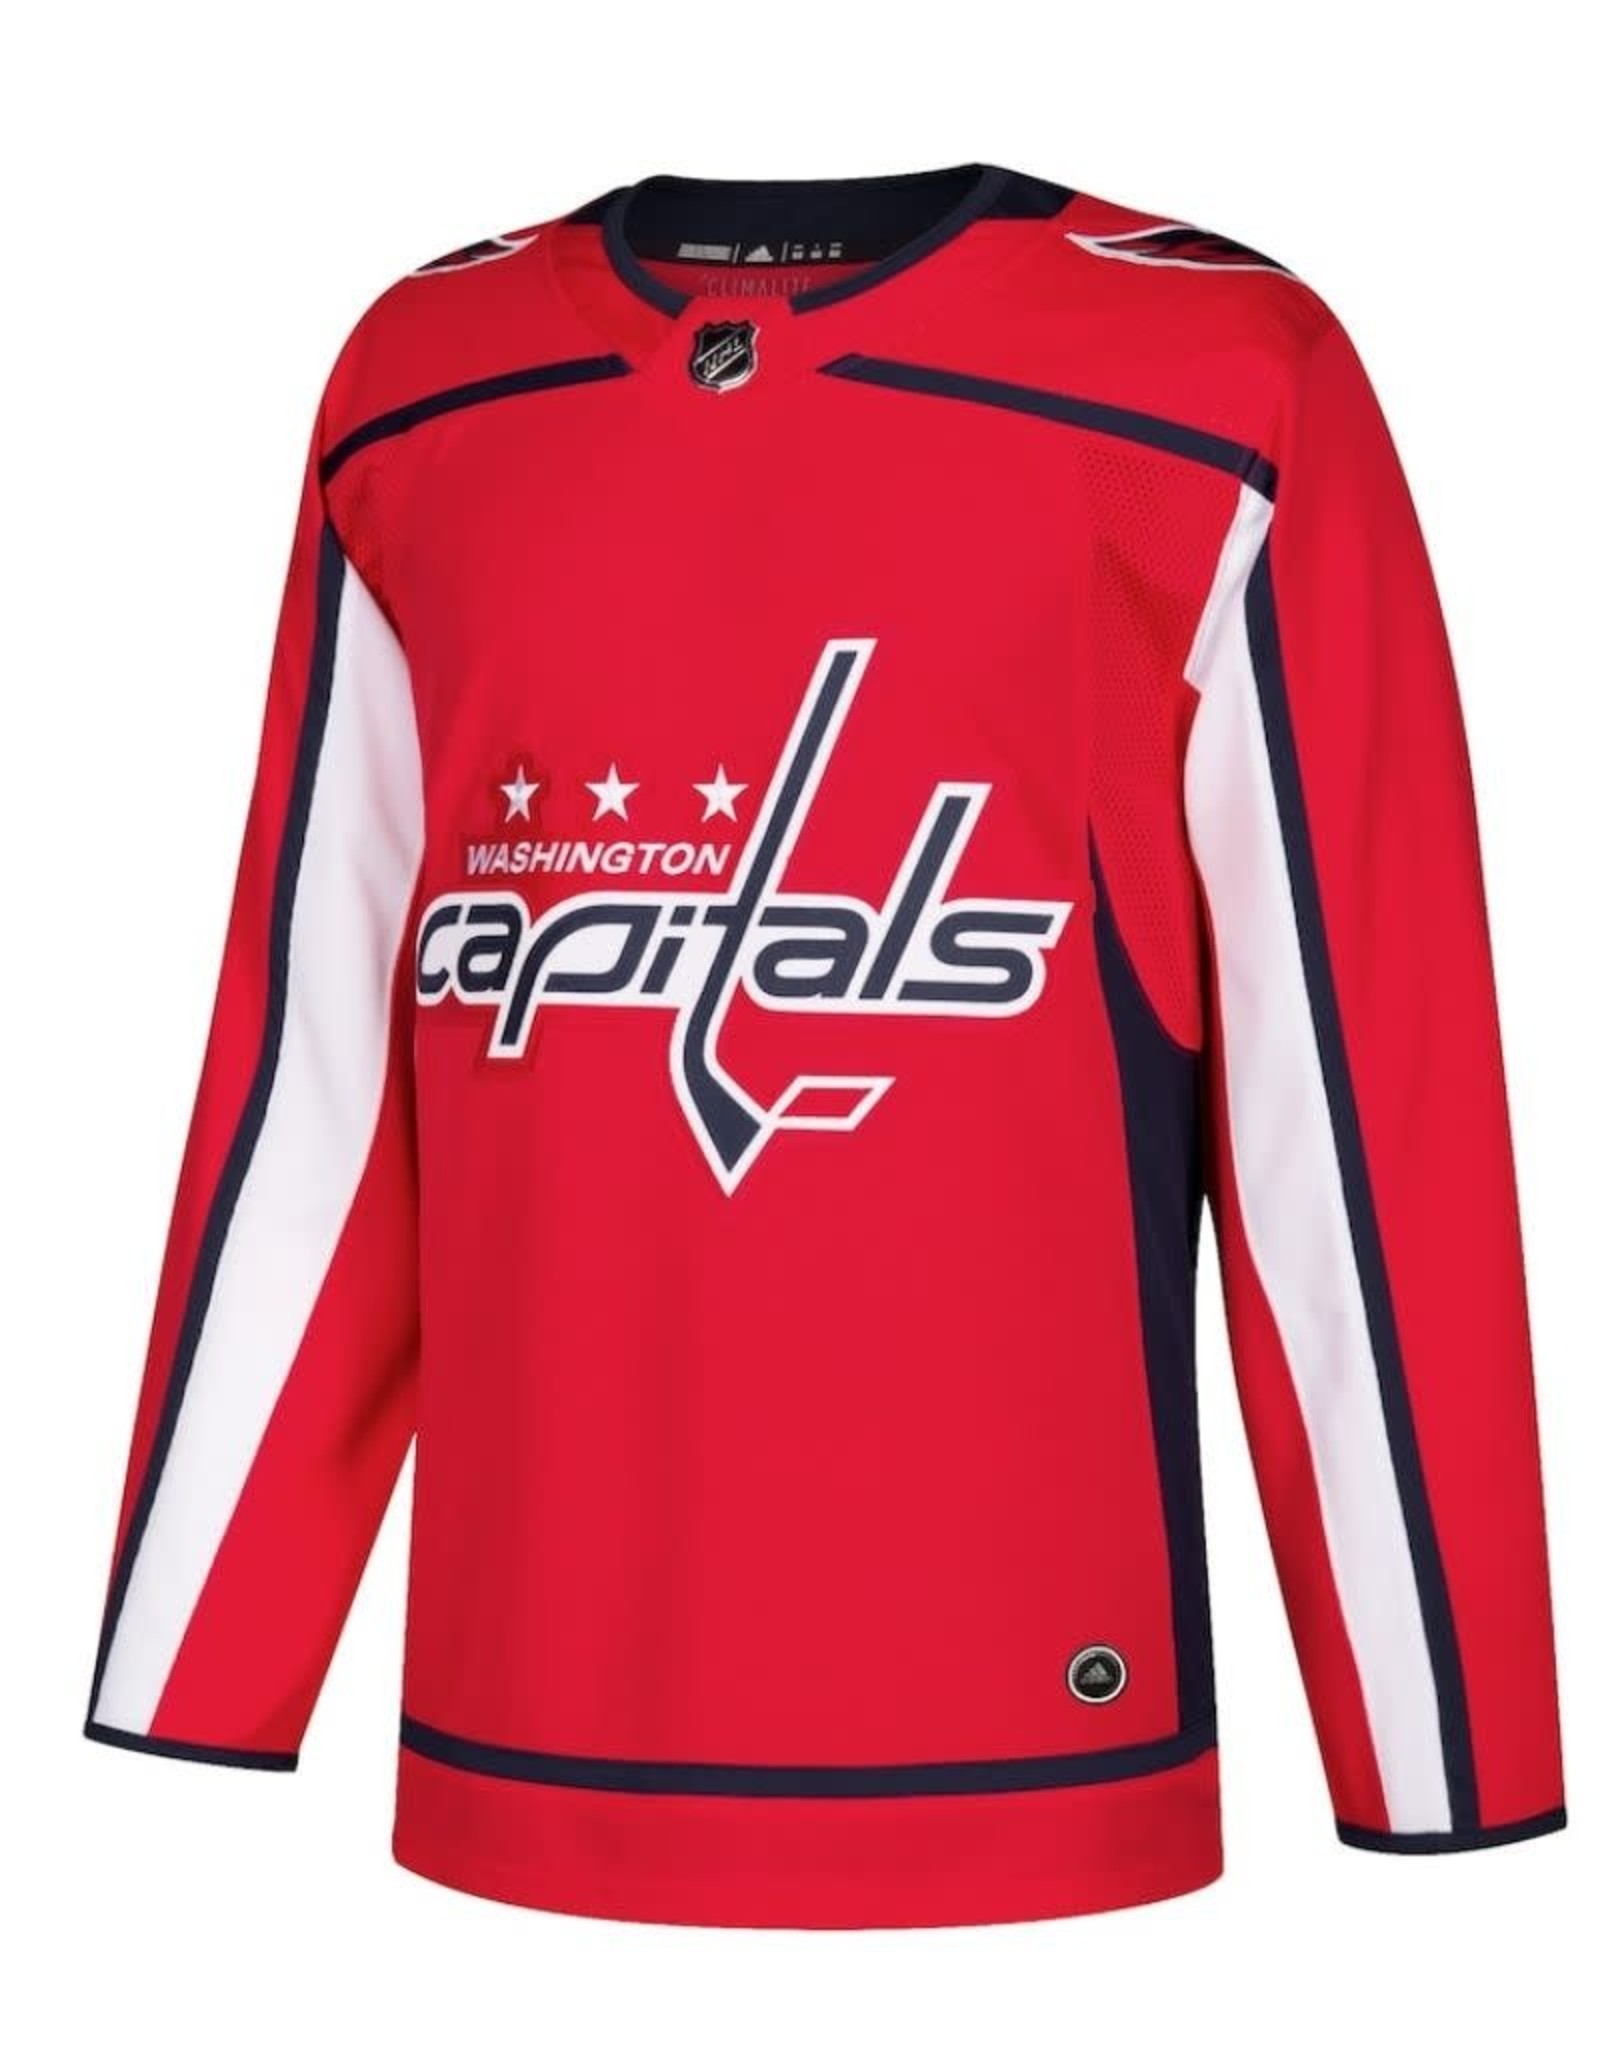 Adidas Adidas Jersey Washington Capitals Red